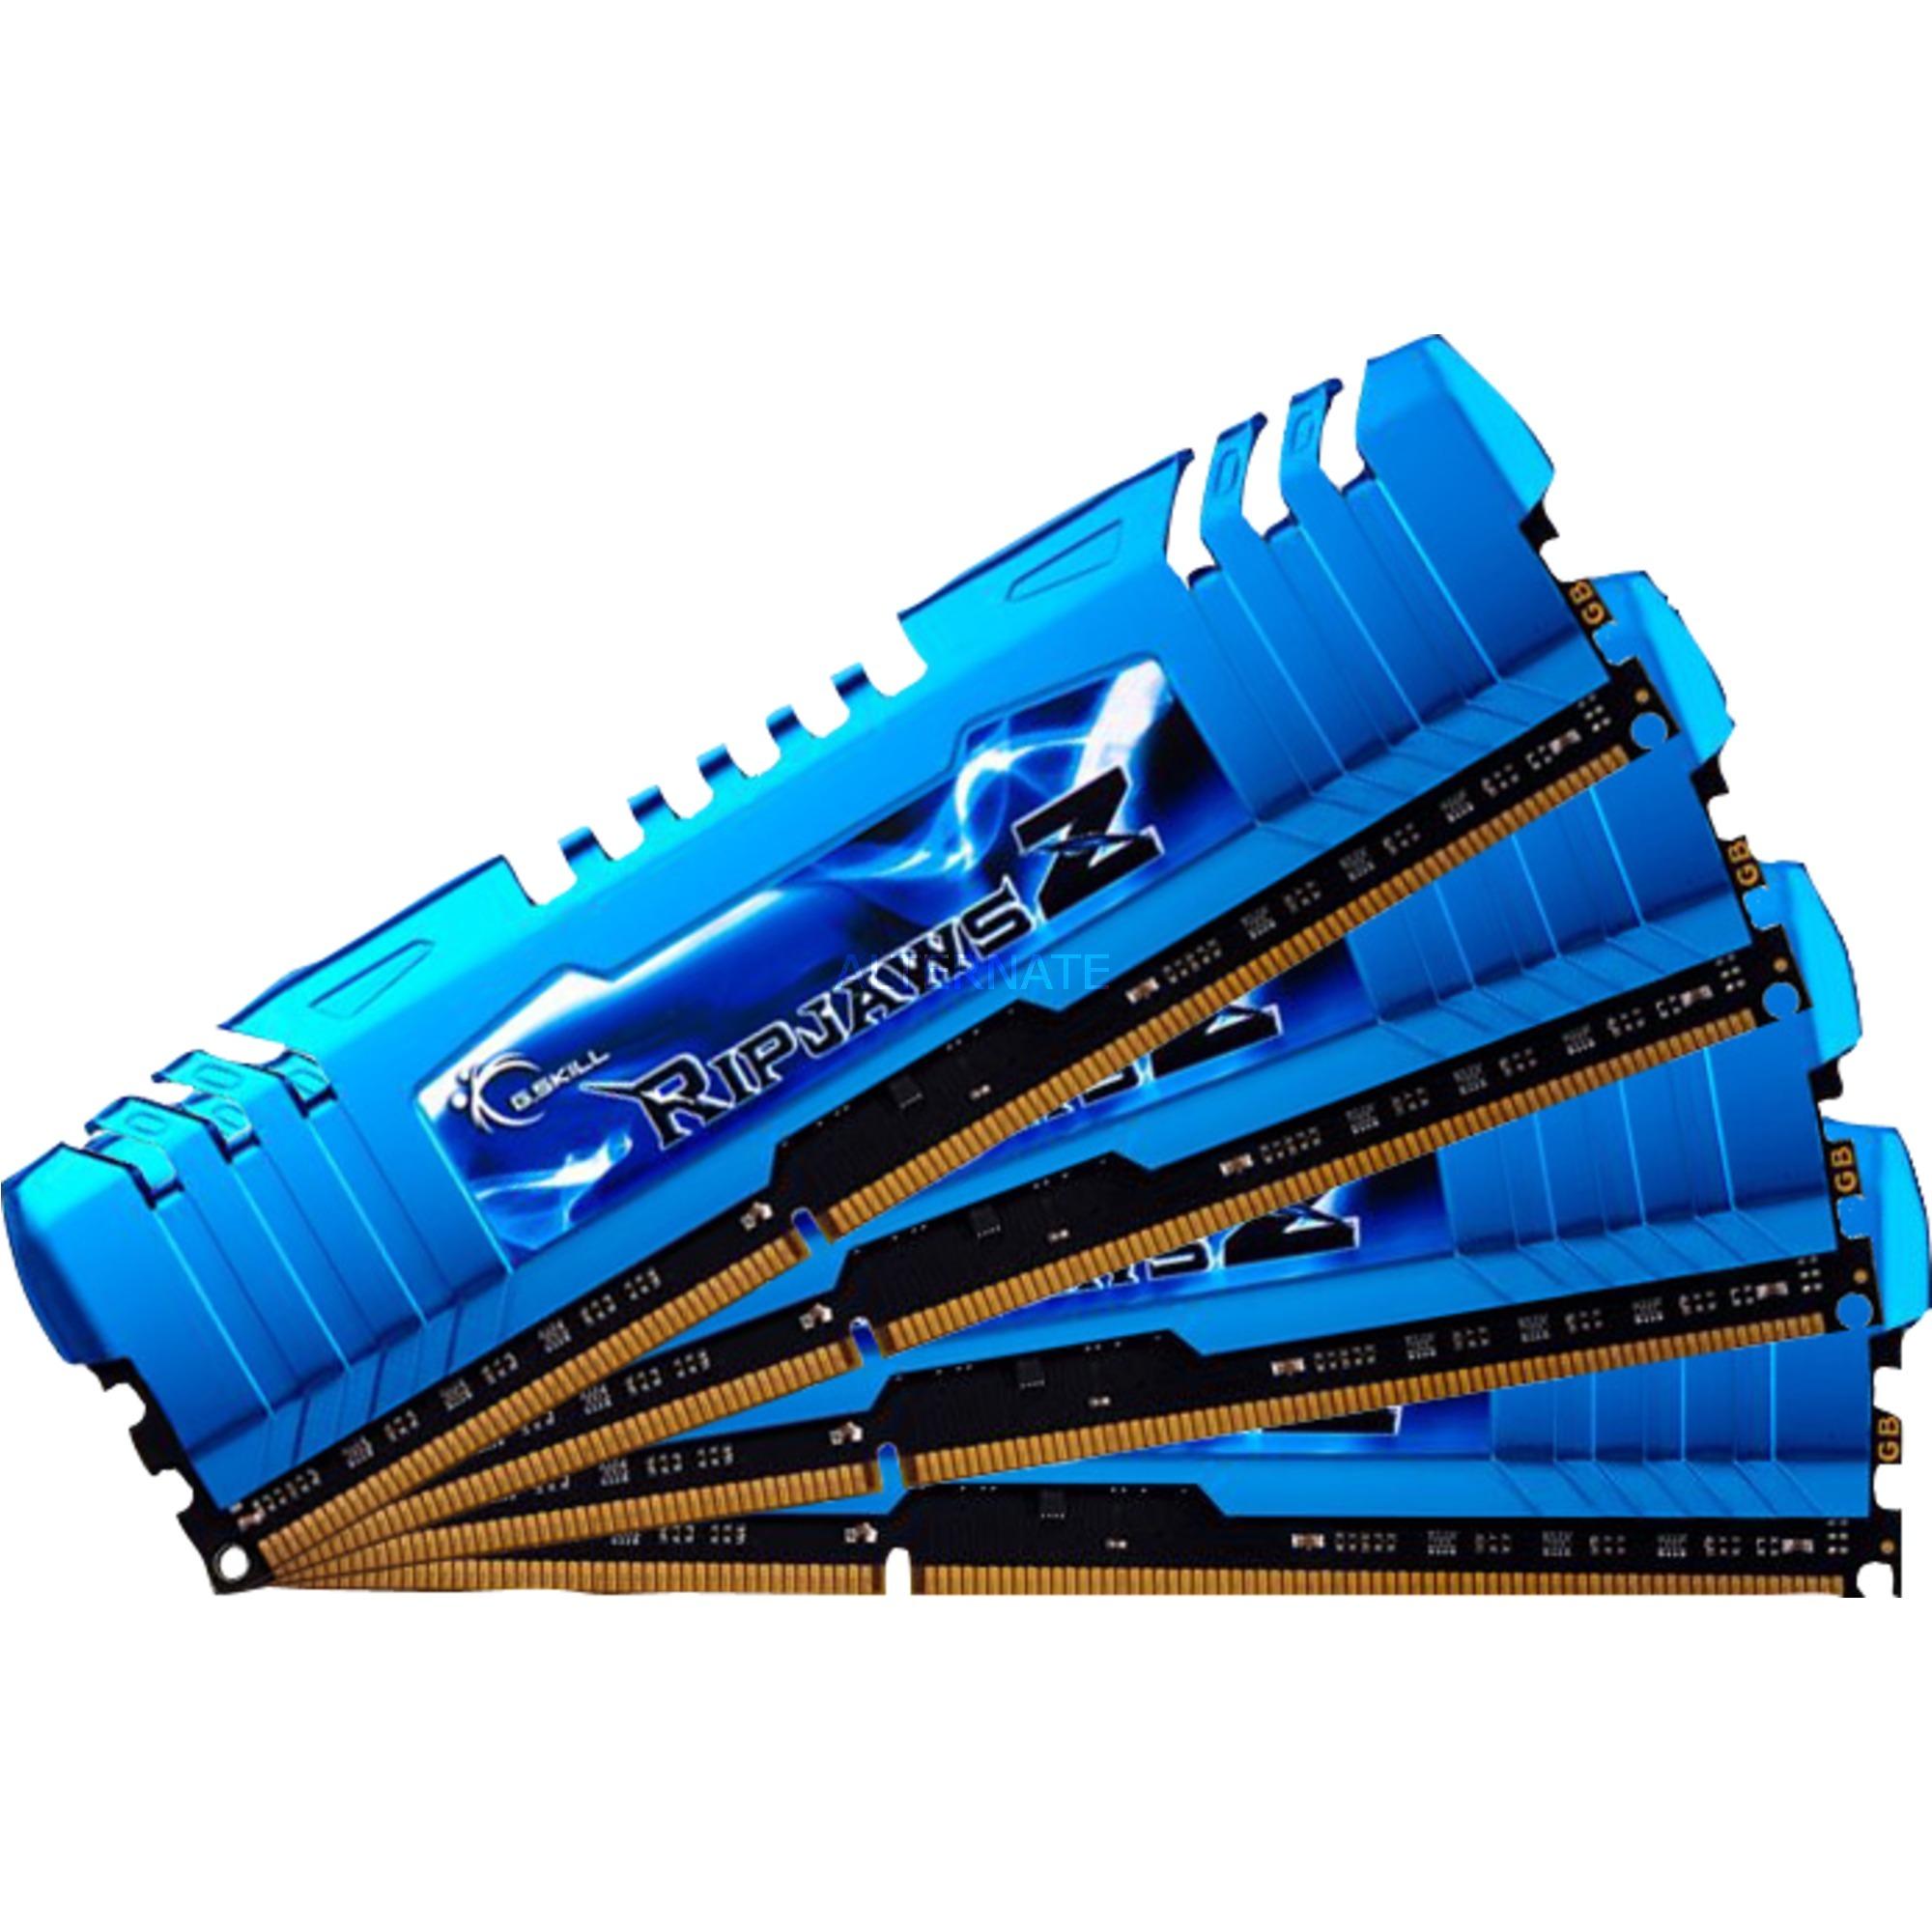 16GB DDR3-2133 módulo de memoria 2133 MHz, Memoria RAM